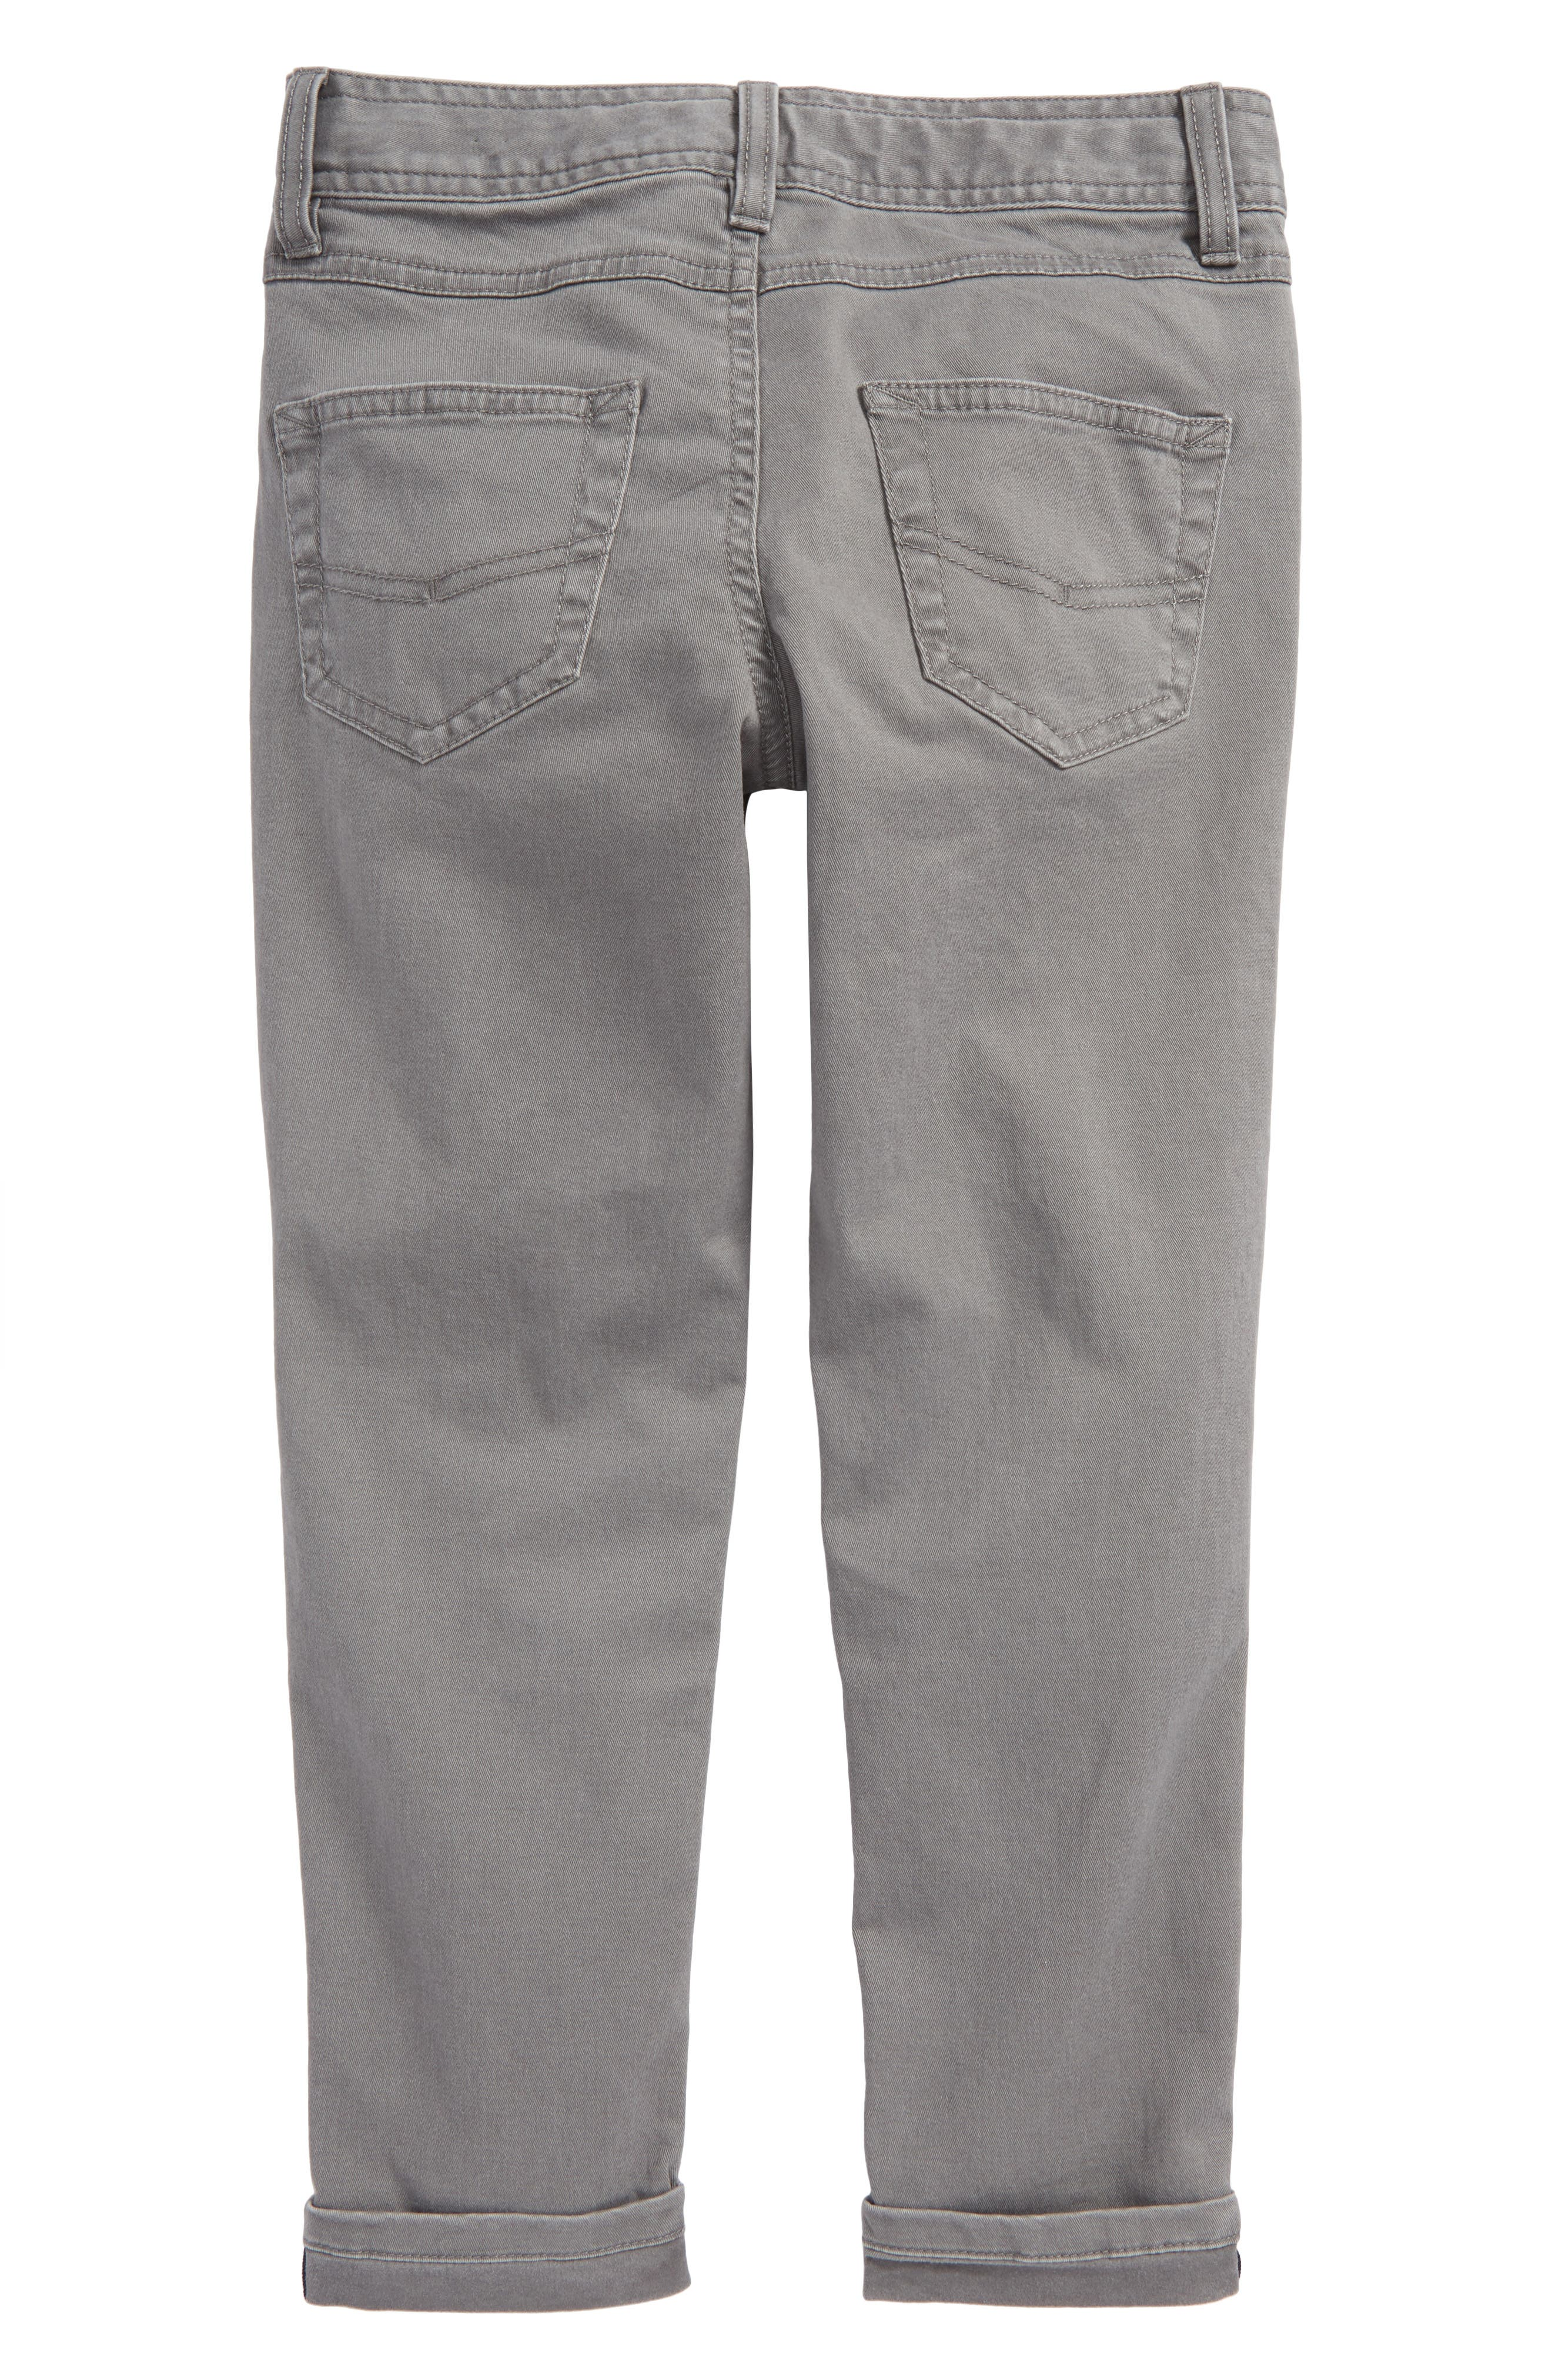 TUCKER + TATE Twill Pants, Main, color, 021